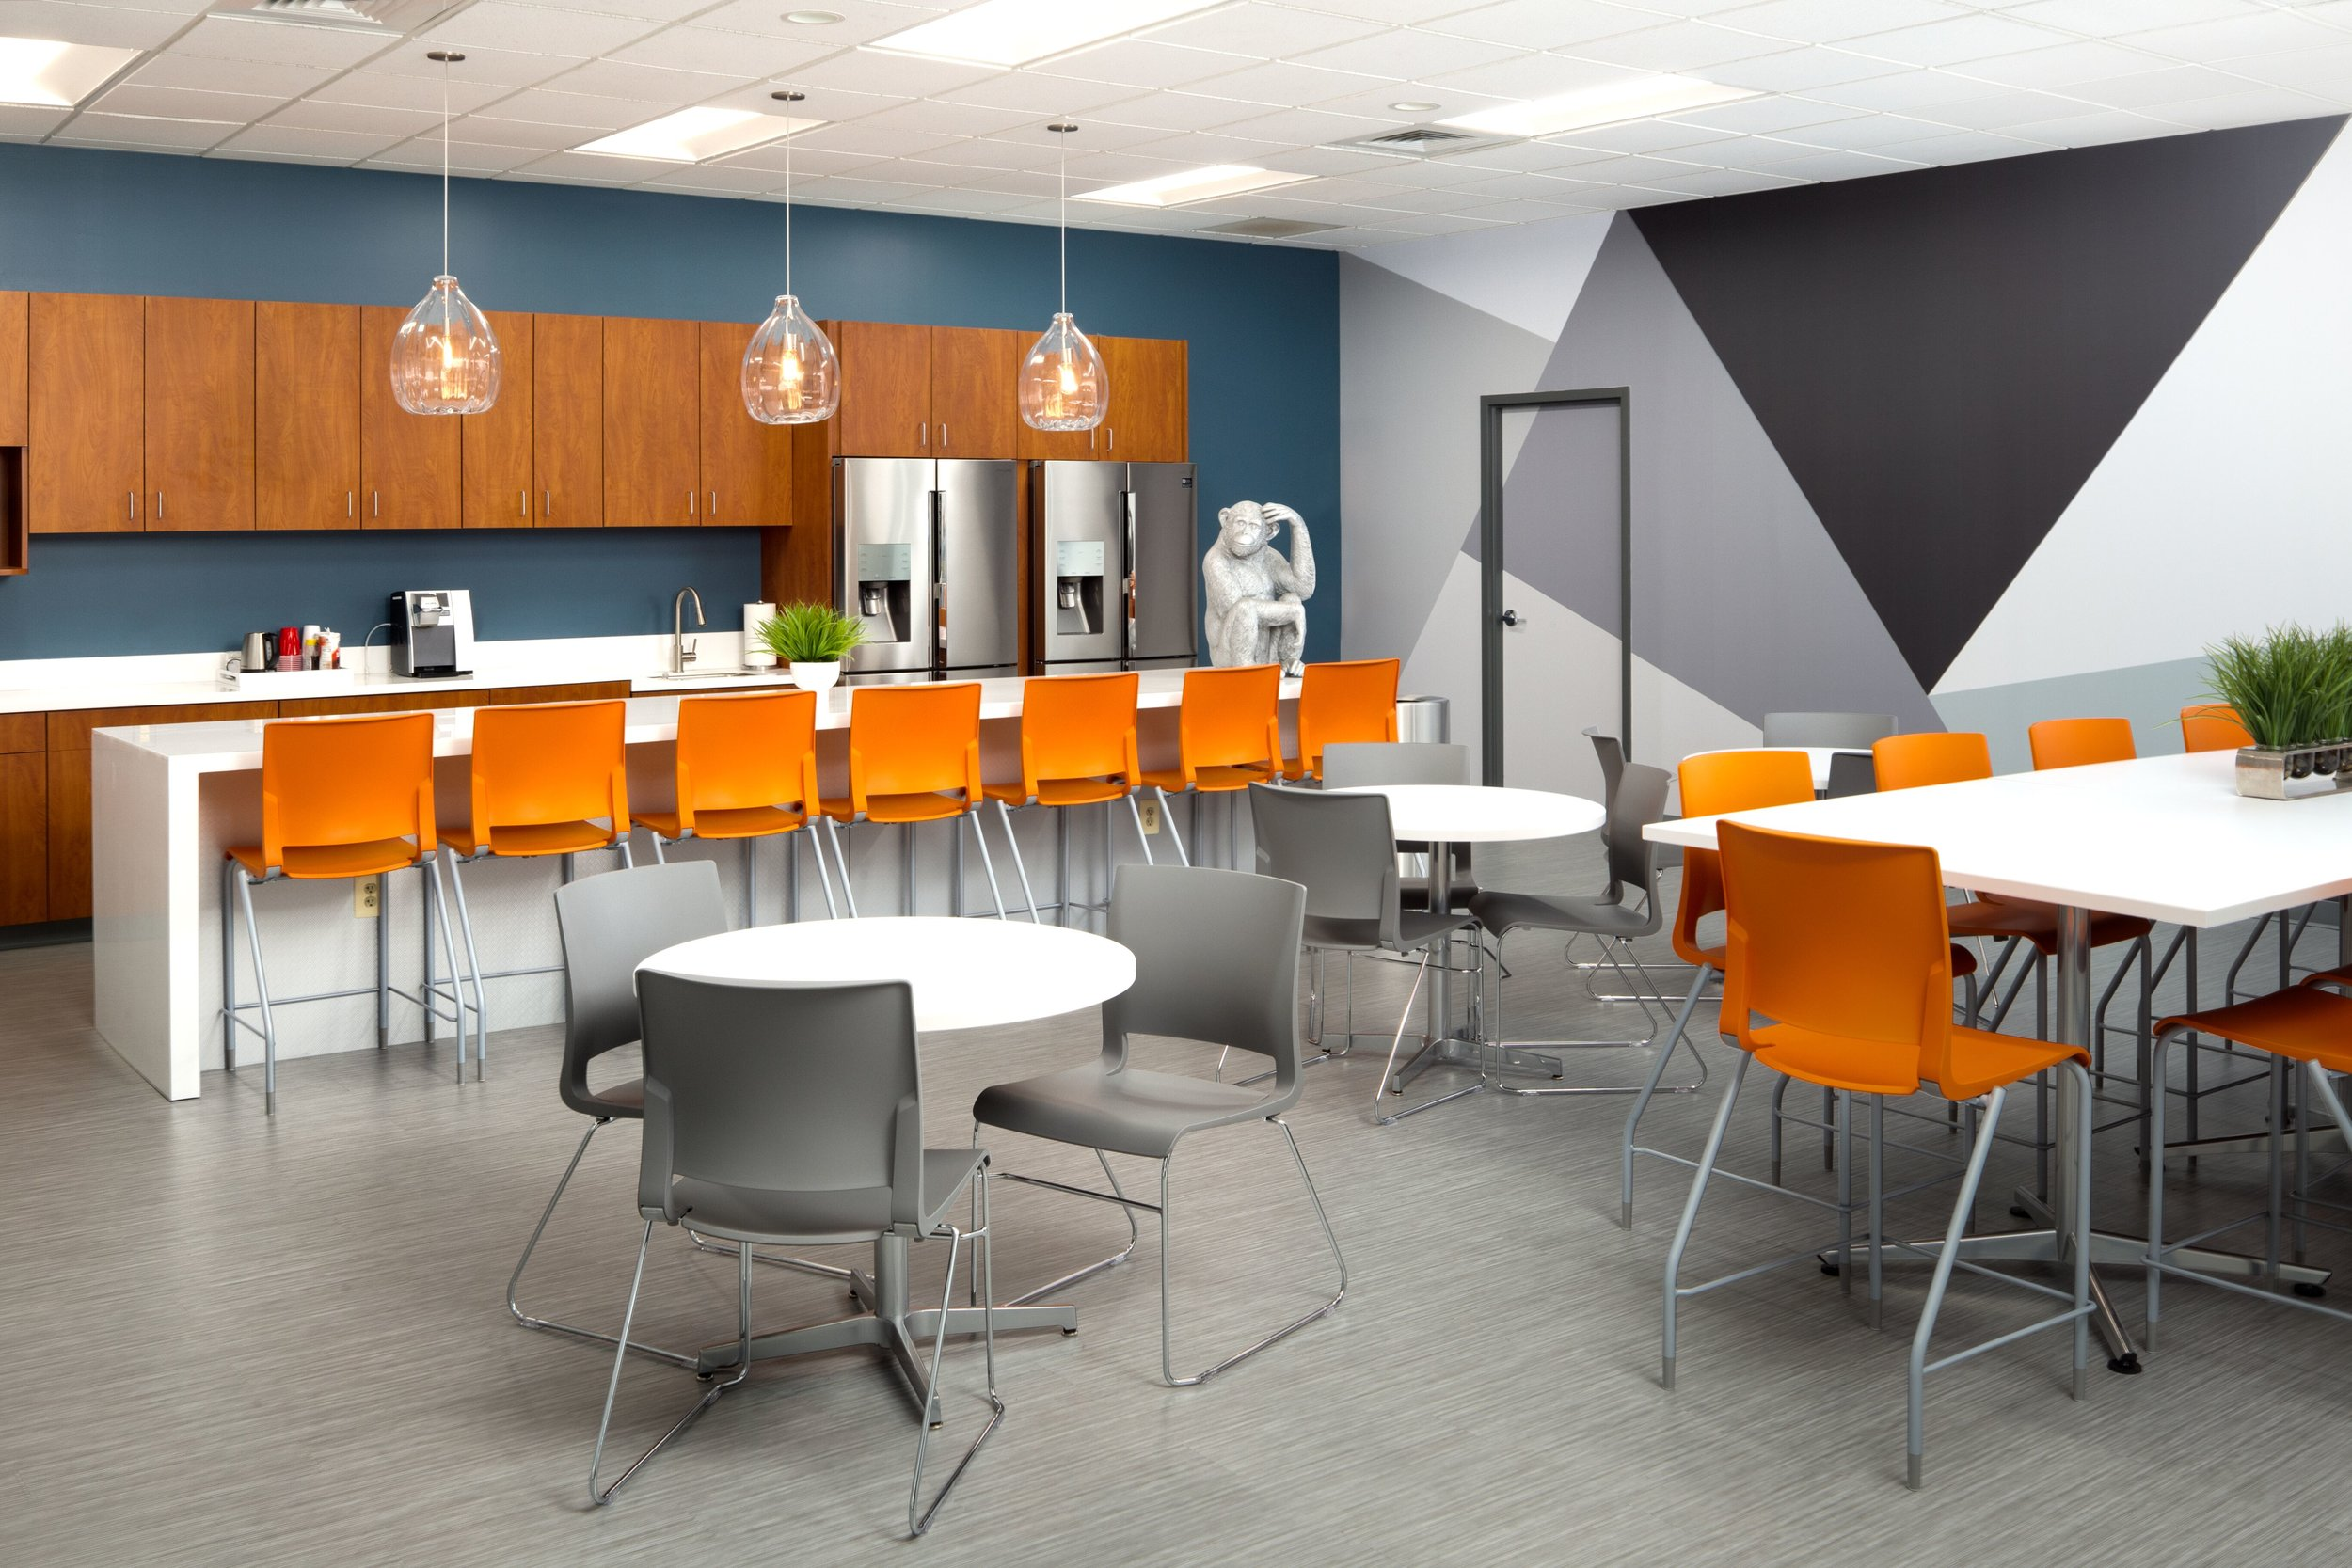 Kitchen/lunchroom - after